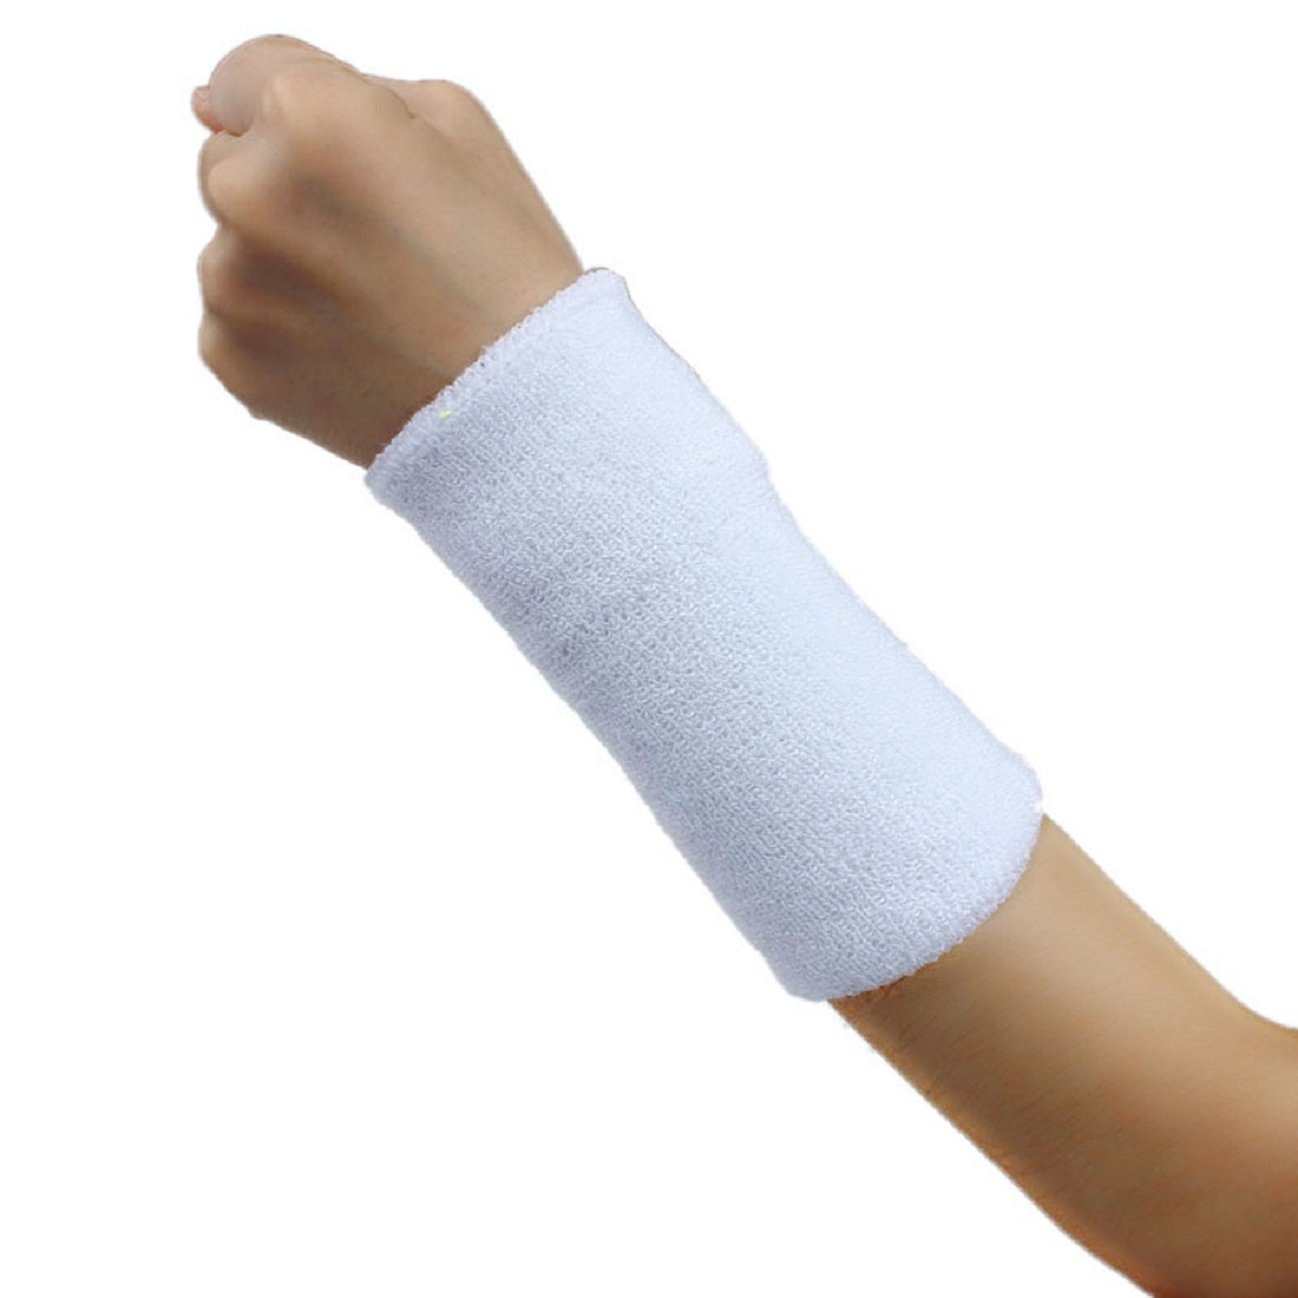 Tonsee 1 PCS Unisex Cotton Basketball Tennis Gym Yoga Sweatband Wristband (White)